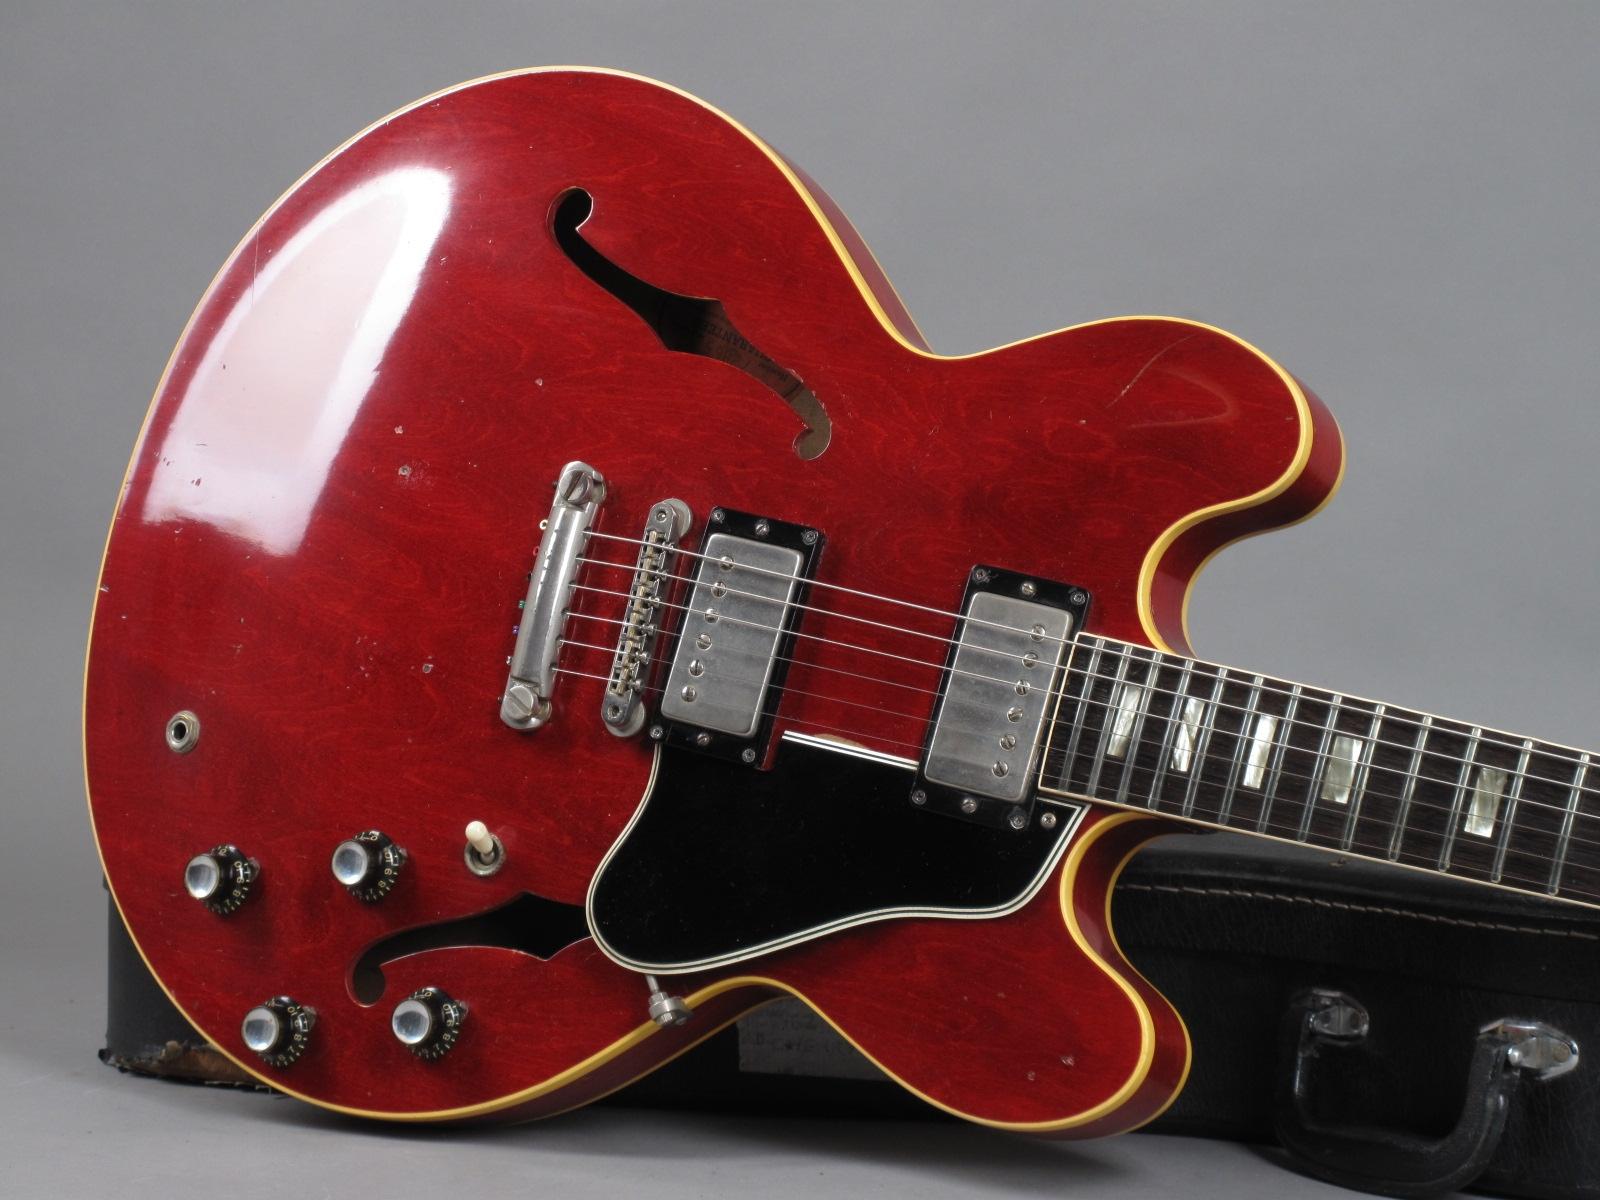 https://guitarpoint.de/app/uploads/products/1962-gibson-es-335-tdc-72865/1962-Gibson-ES-335-TDC-Cherry-72865-19.jpg